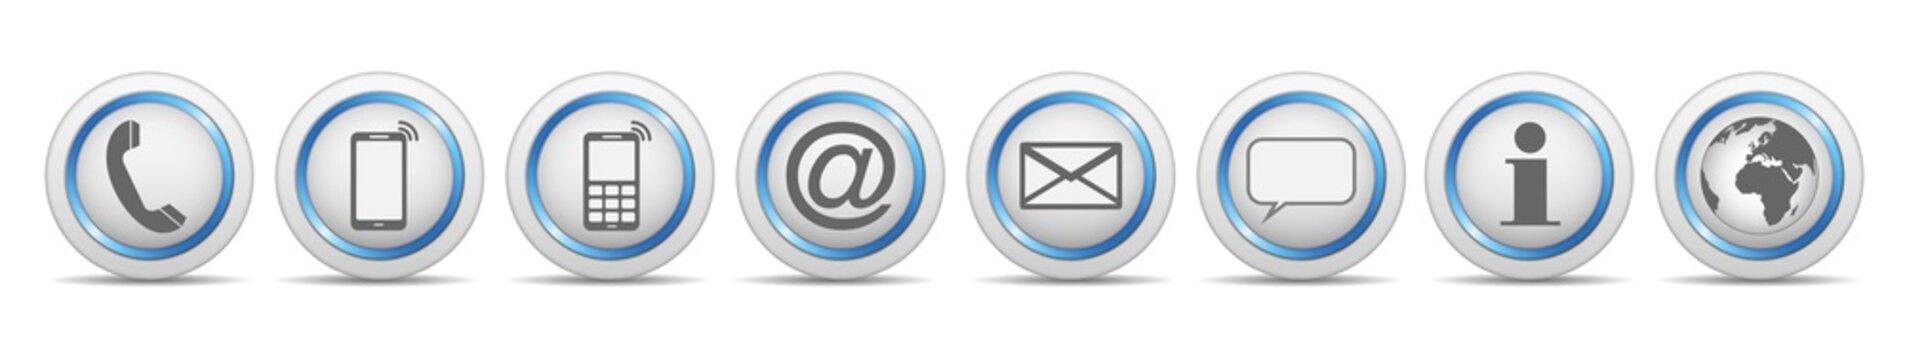 communication contact us icon white blue symbol vector set isolated / kontakt symbol icon vektor set blau weiß isoliert